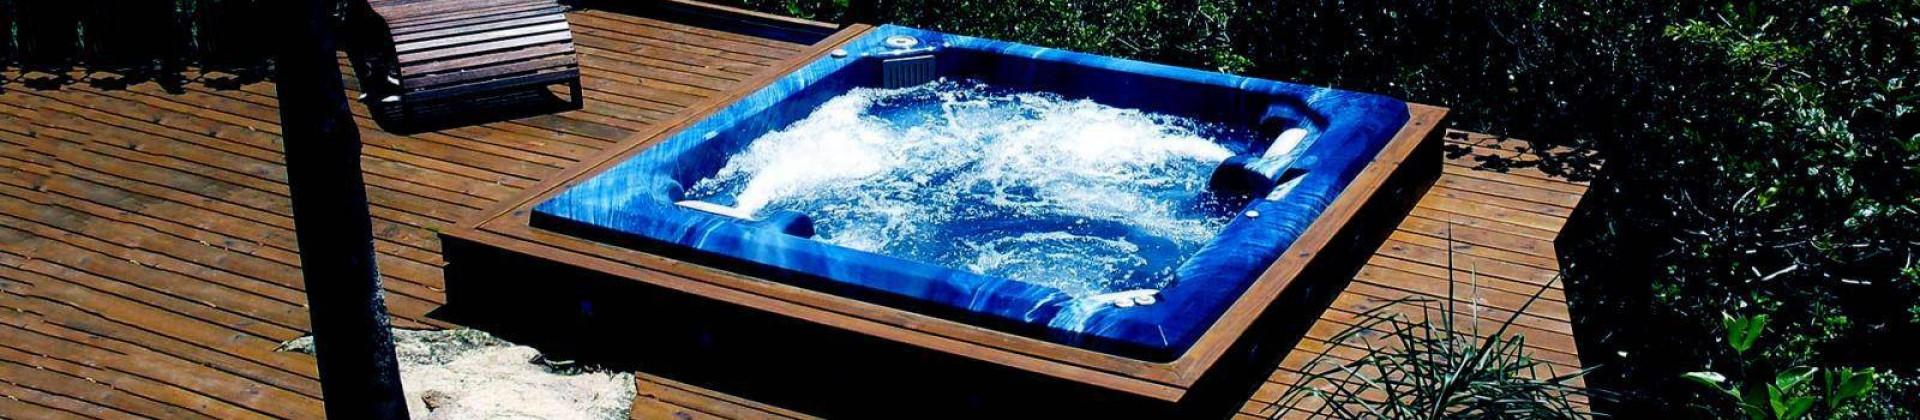 A Jet Pool